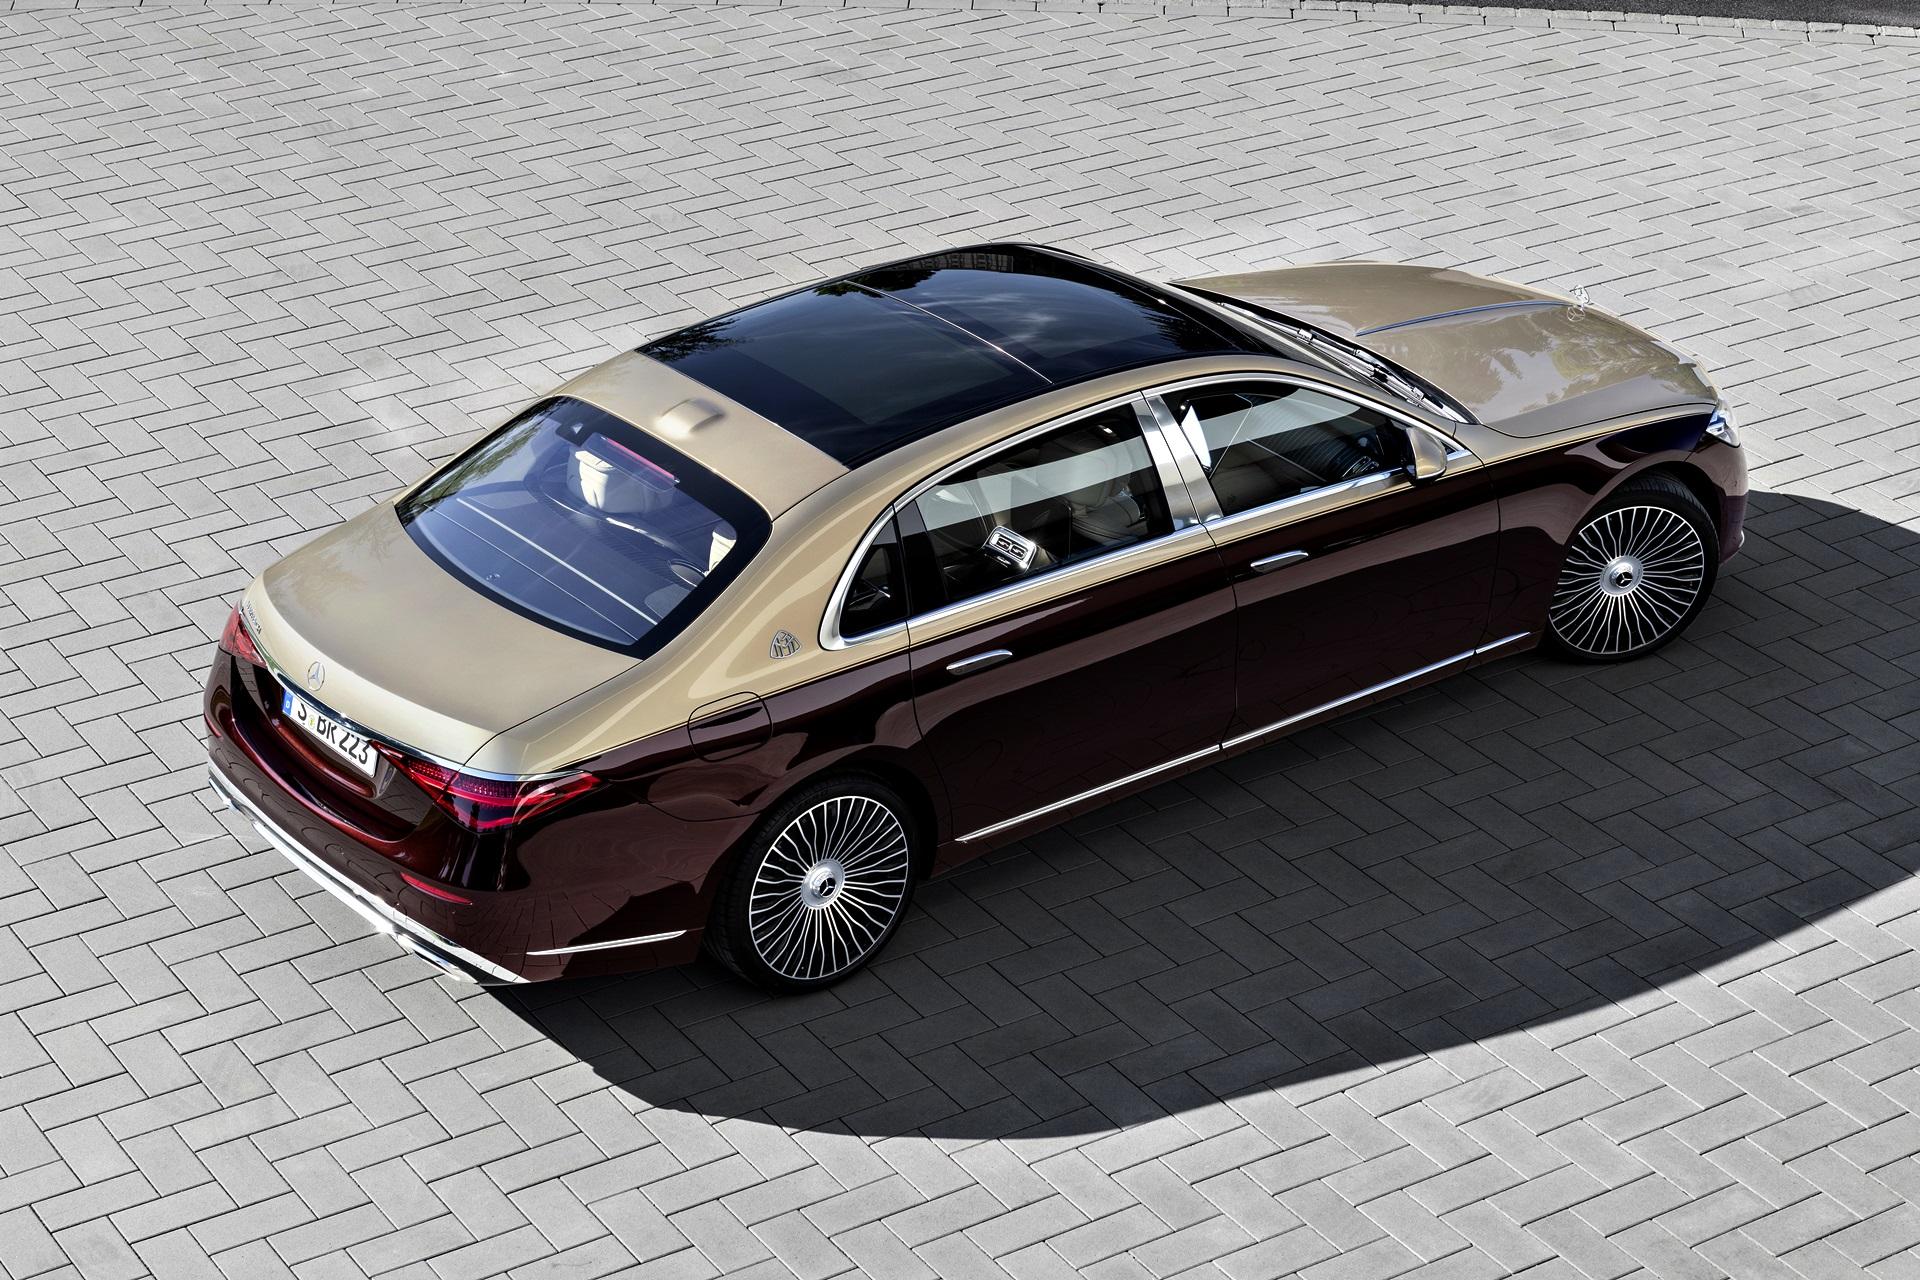 Mercedes Maybach S Klasse (z 223), 2020 Mercedes Maybach S Klasse (z 223), 2020